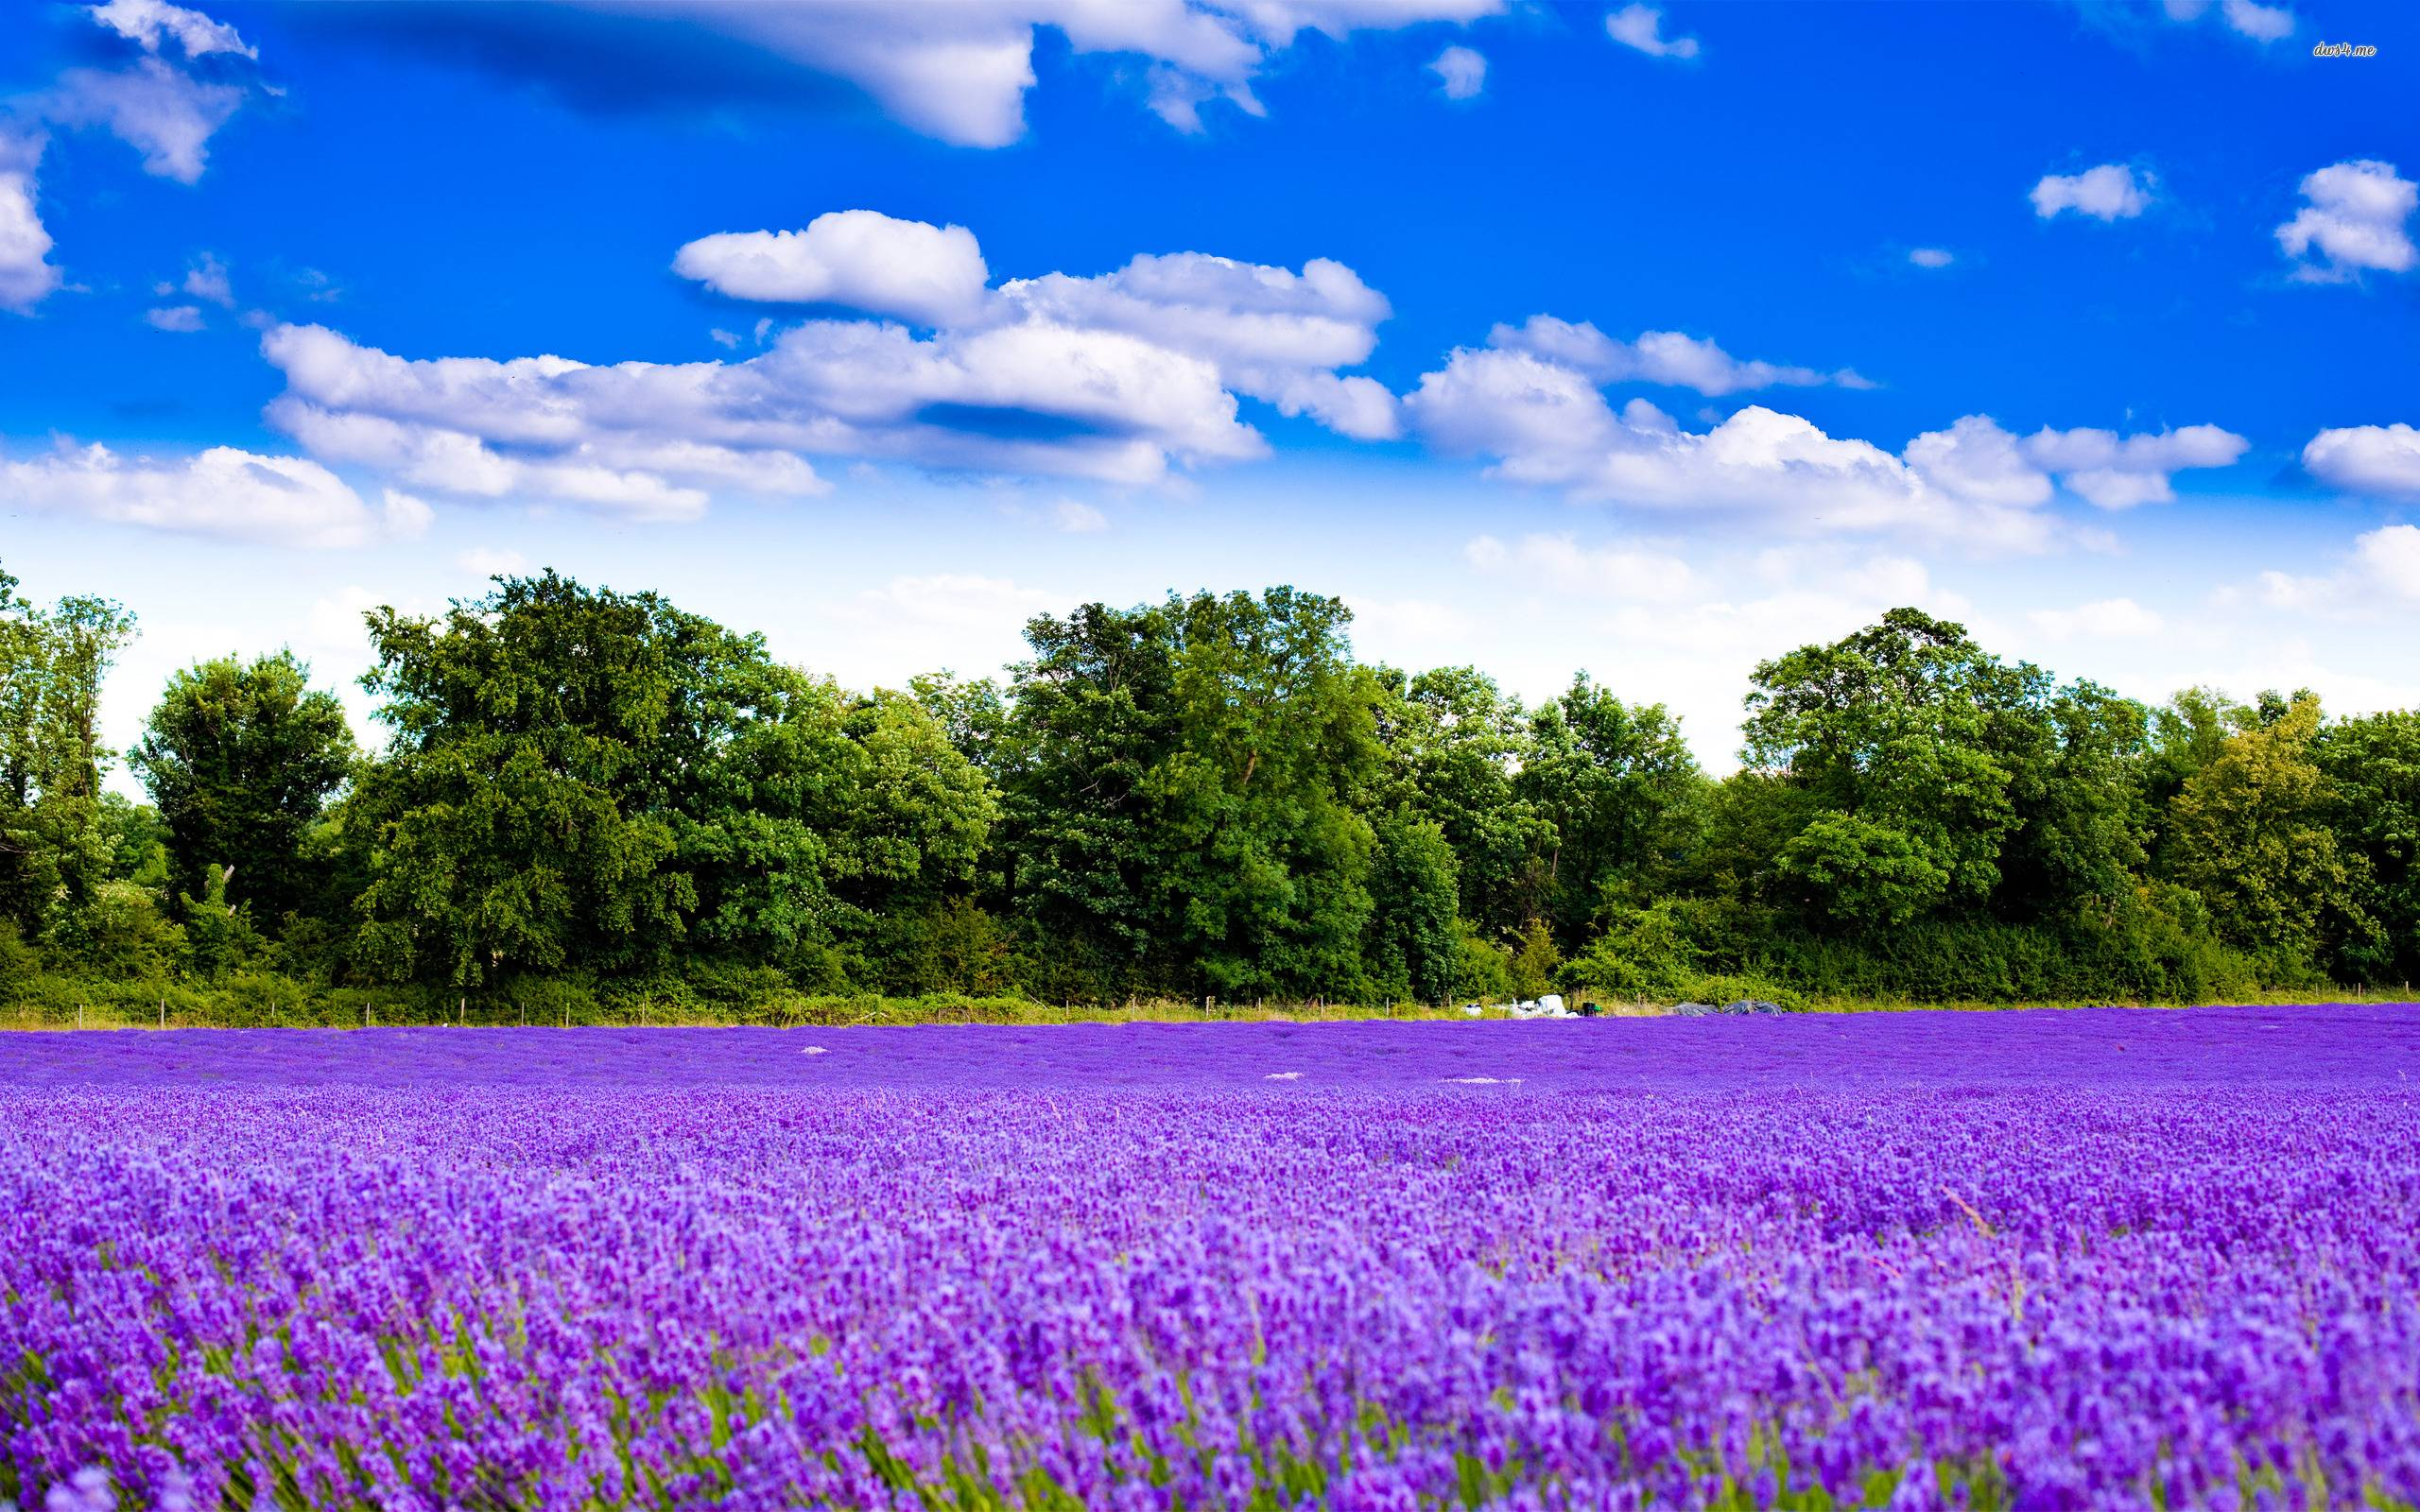 Flower Garden Wallpaper lavender flower wallpapers - wallpaper cave